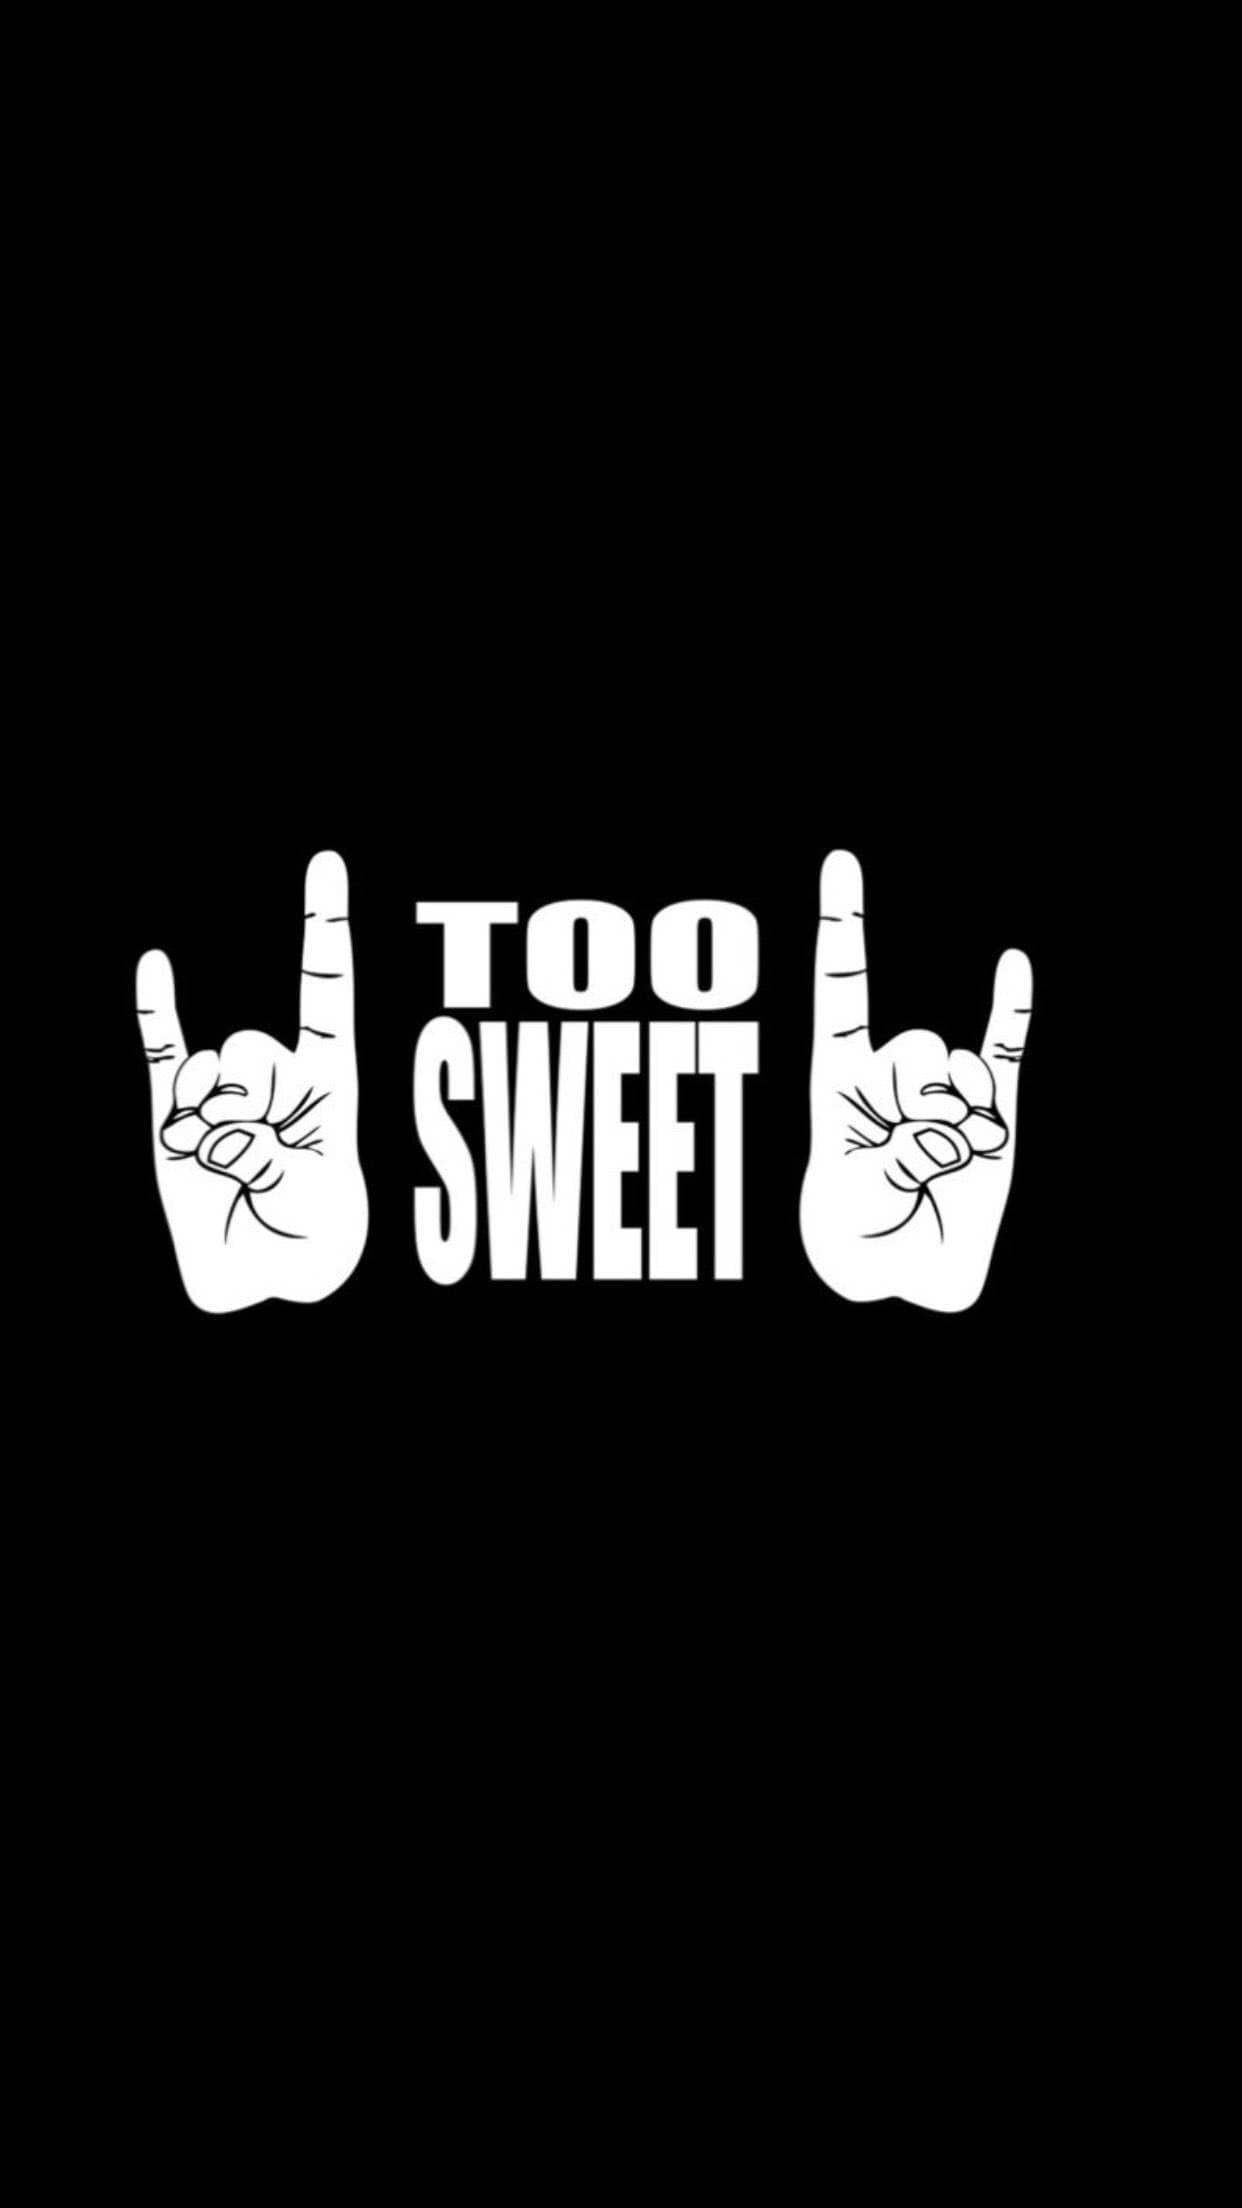 Bullet Club Young Bucks Nwo Too Sweet Wolfpack Car Vinyl Decal